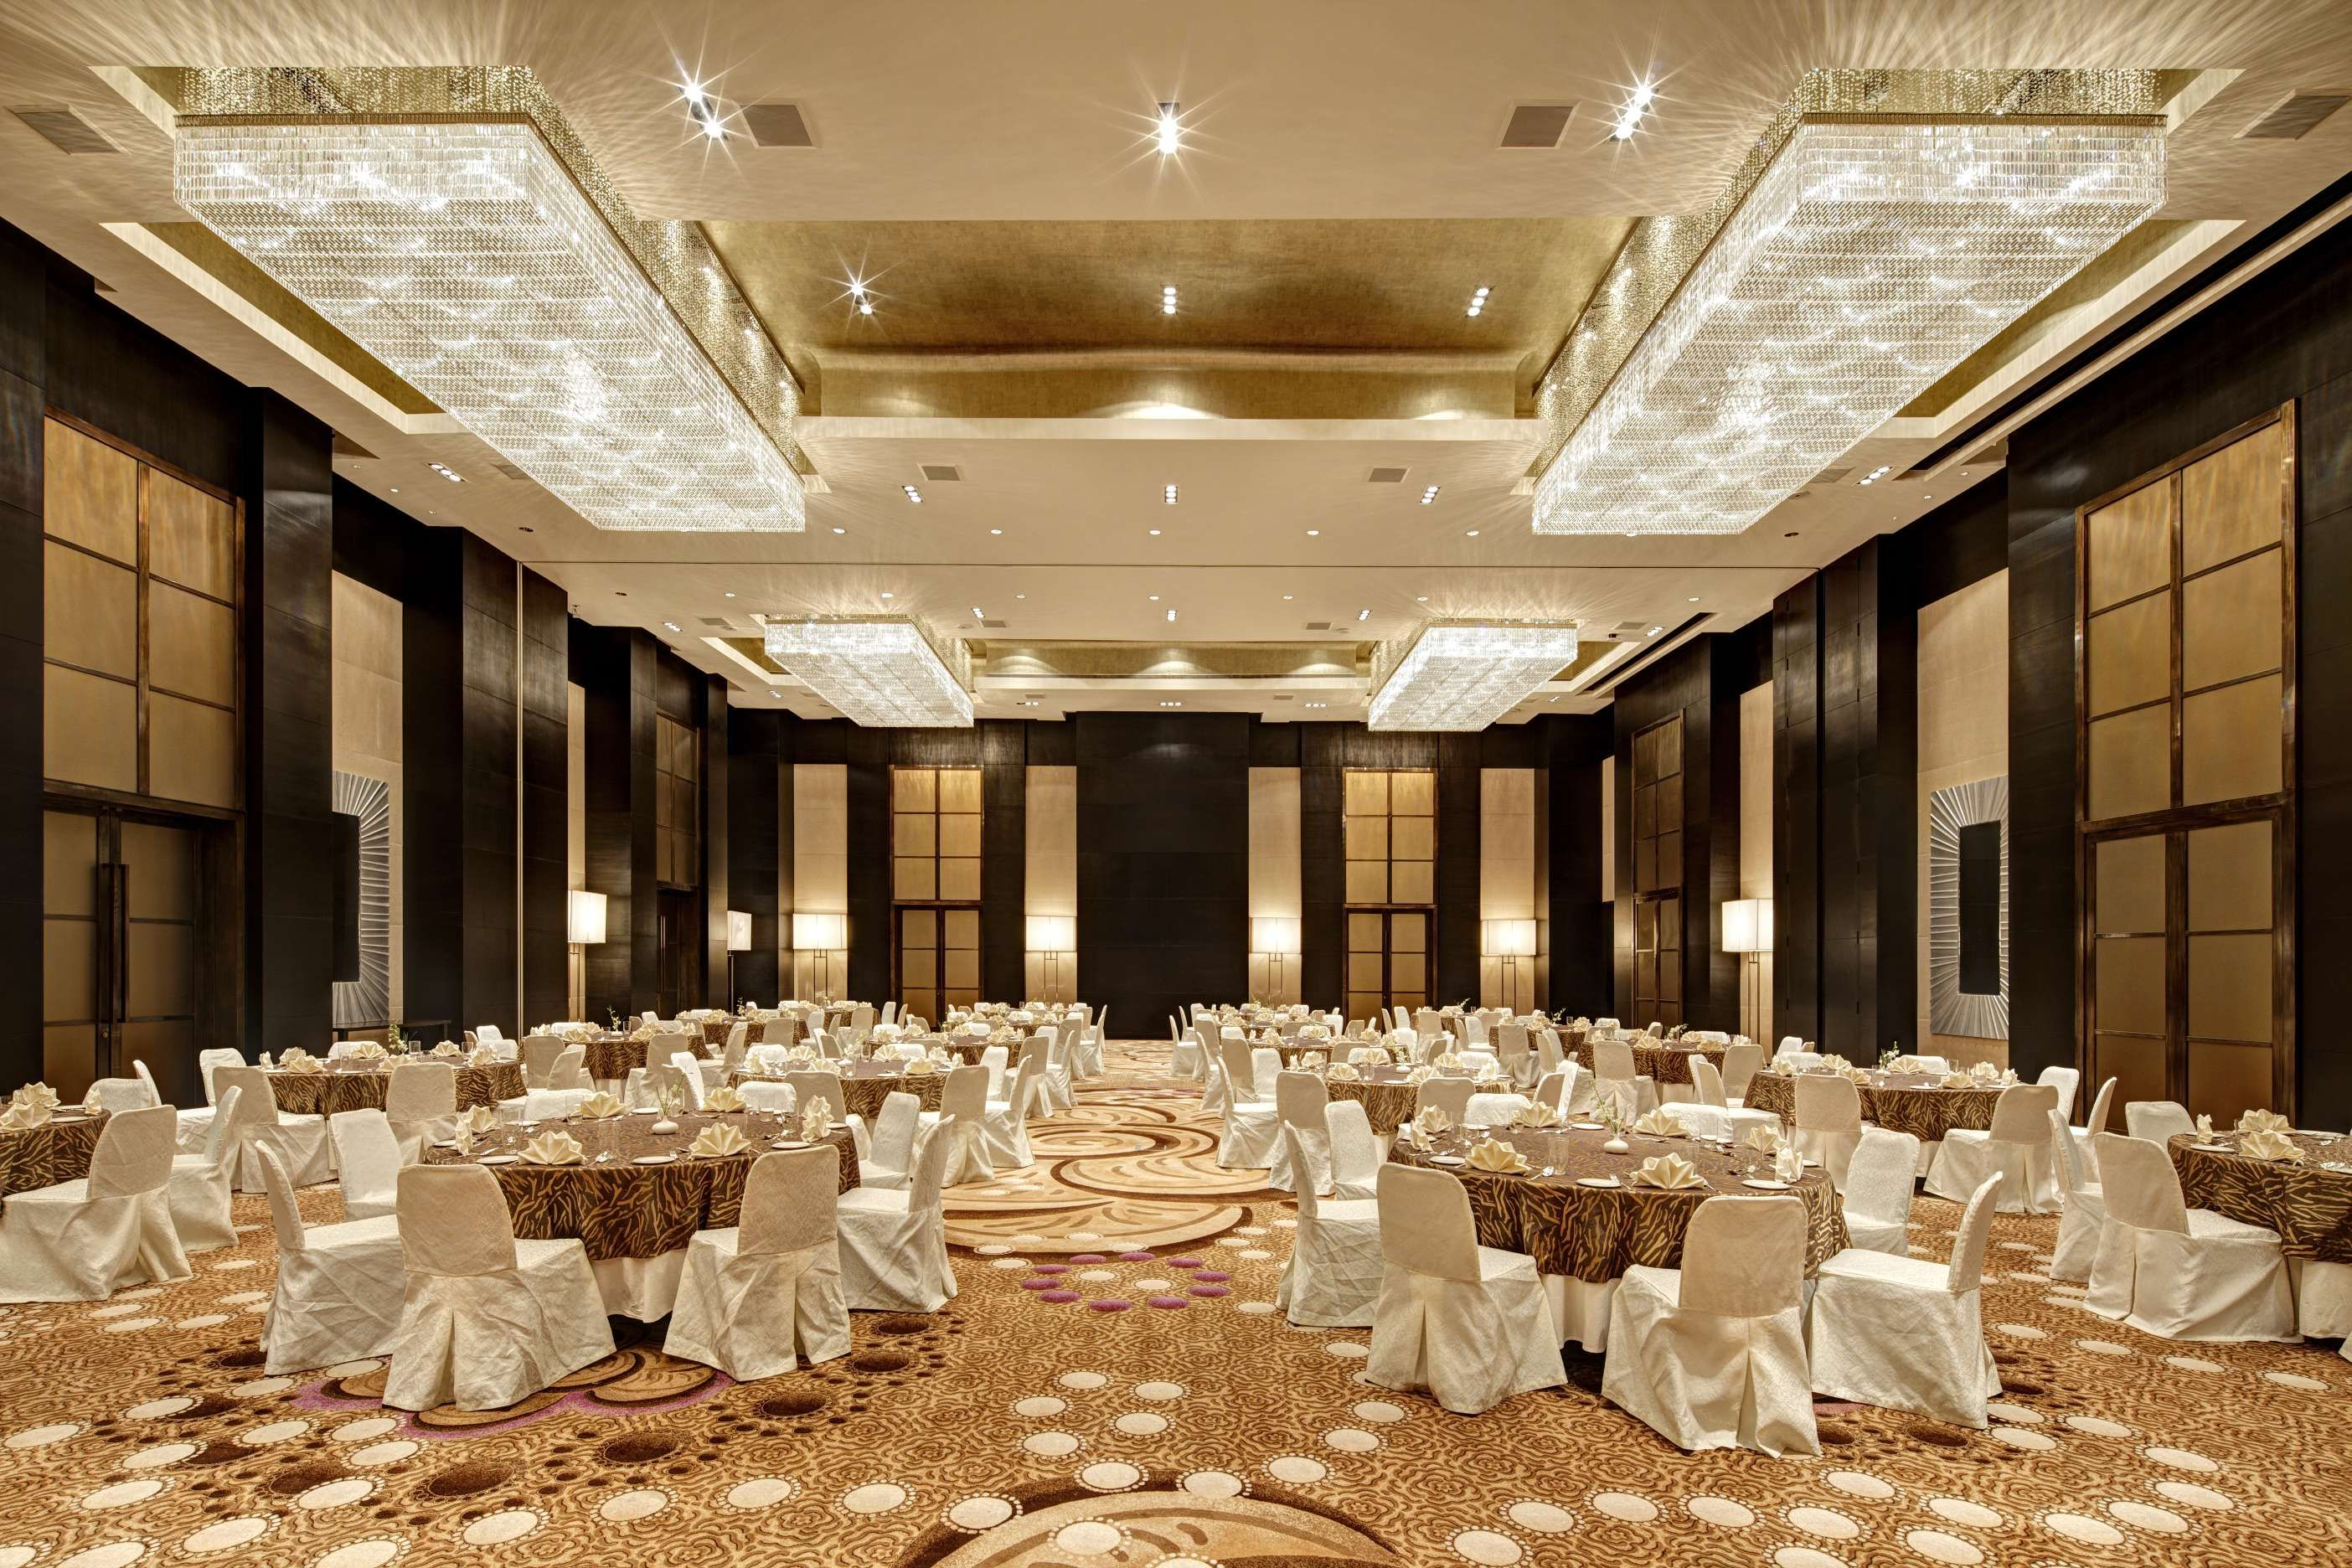 Luxury Wedding Venue Plans: PARK HYATT HYDERABAD Centrally Located In The Heart Of